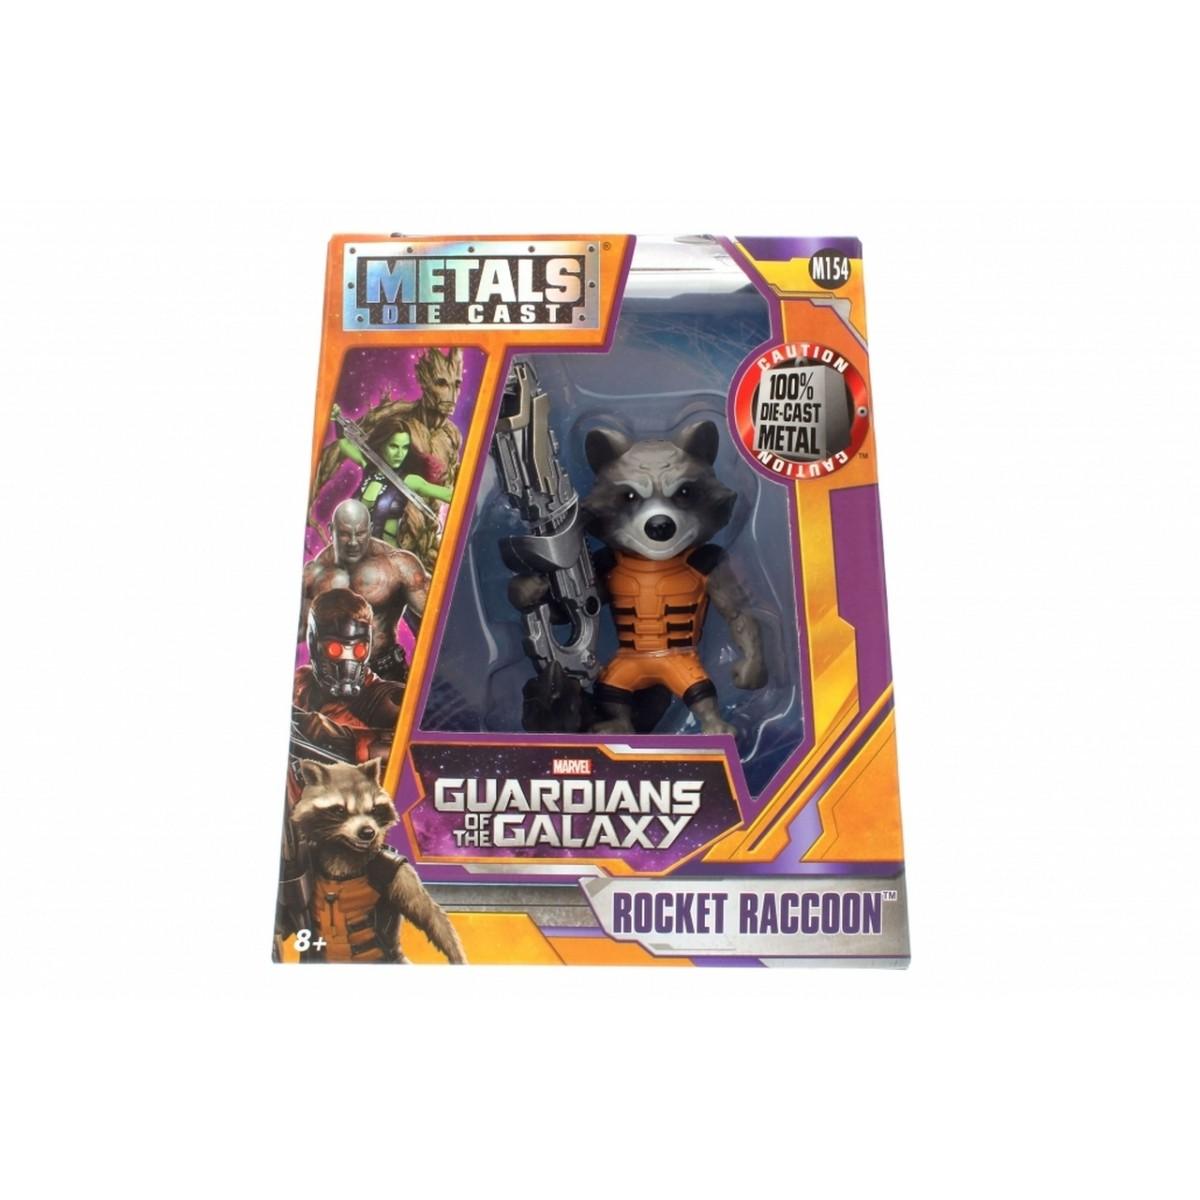 Metals Die Cast Rocket Raccoon: Guardiões da Galáxia (M154) - DTC